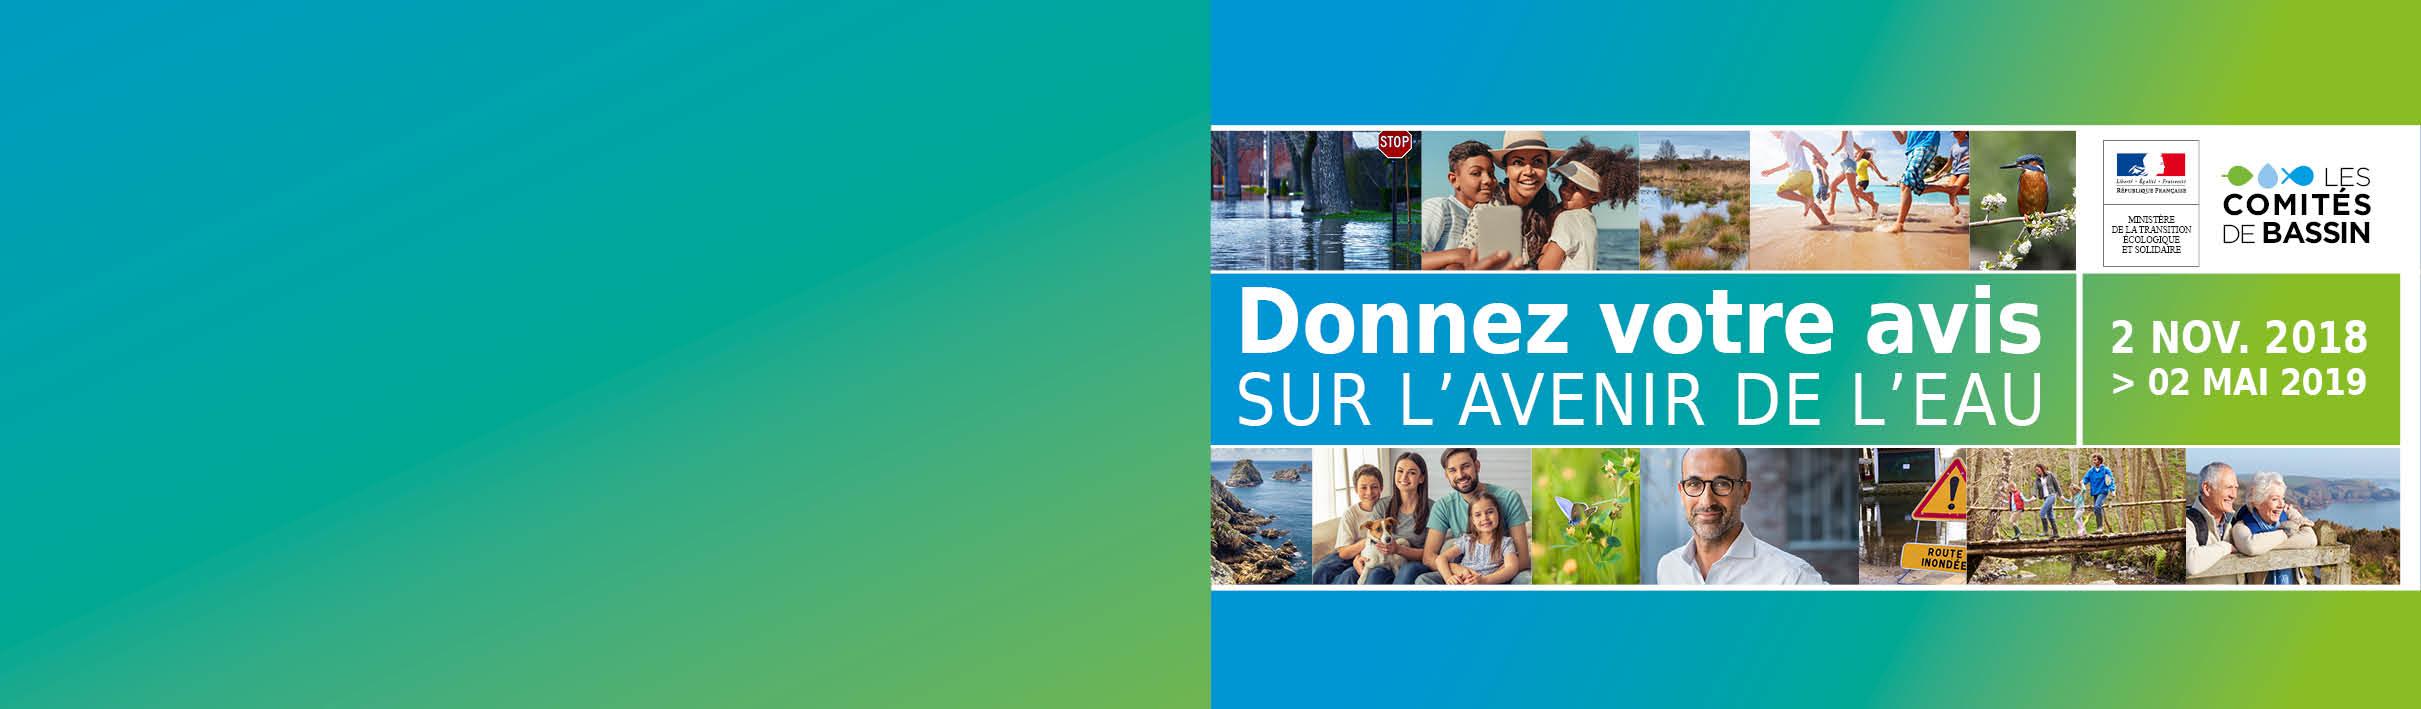 bandeau_breves_consultation_2018.jpg